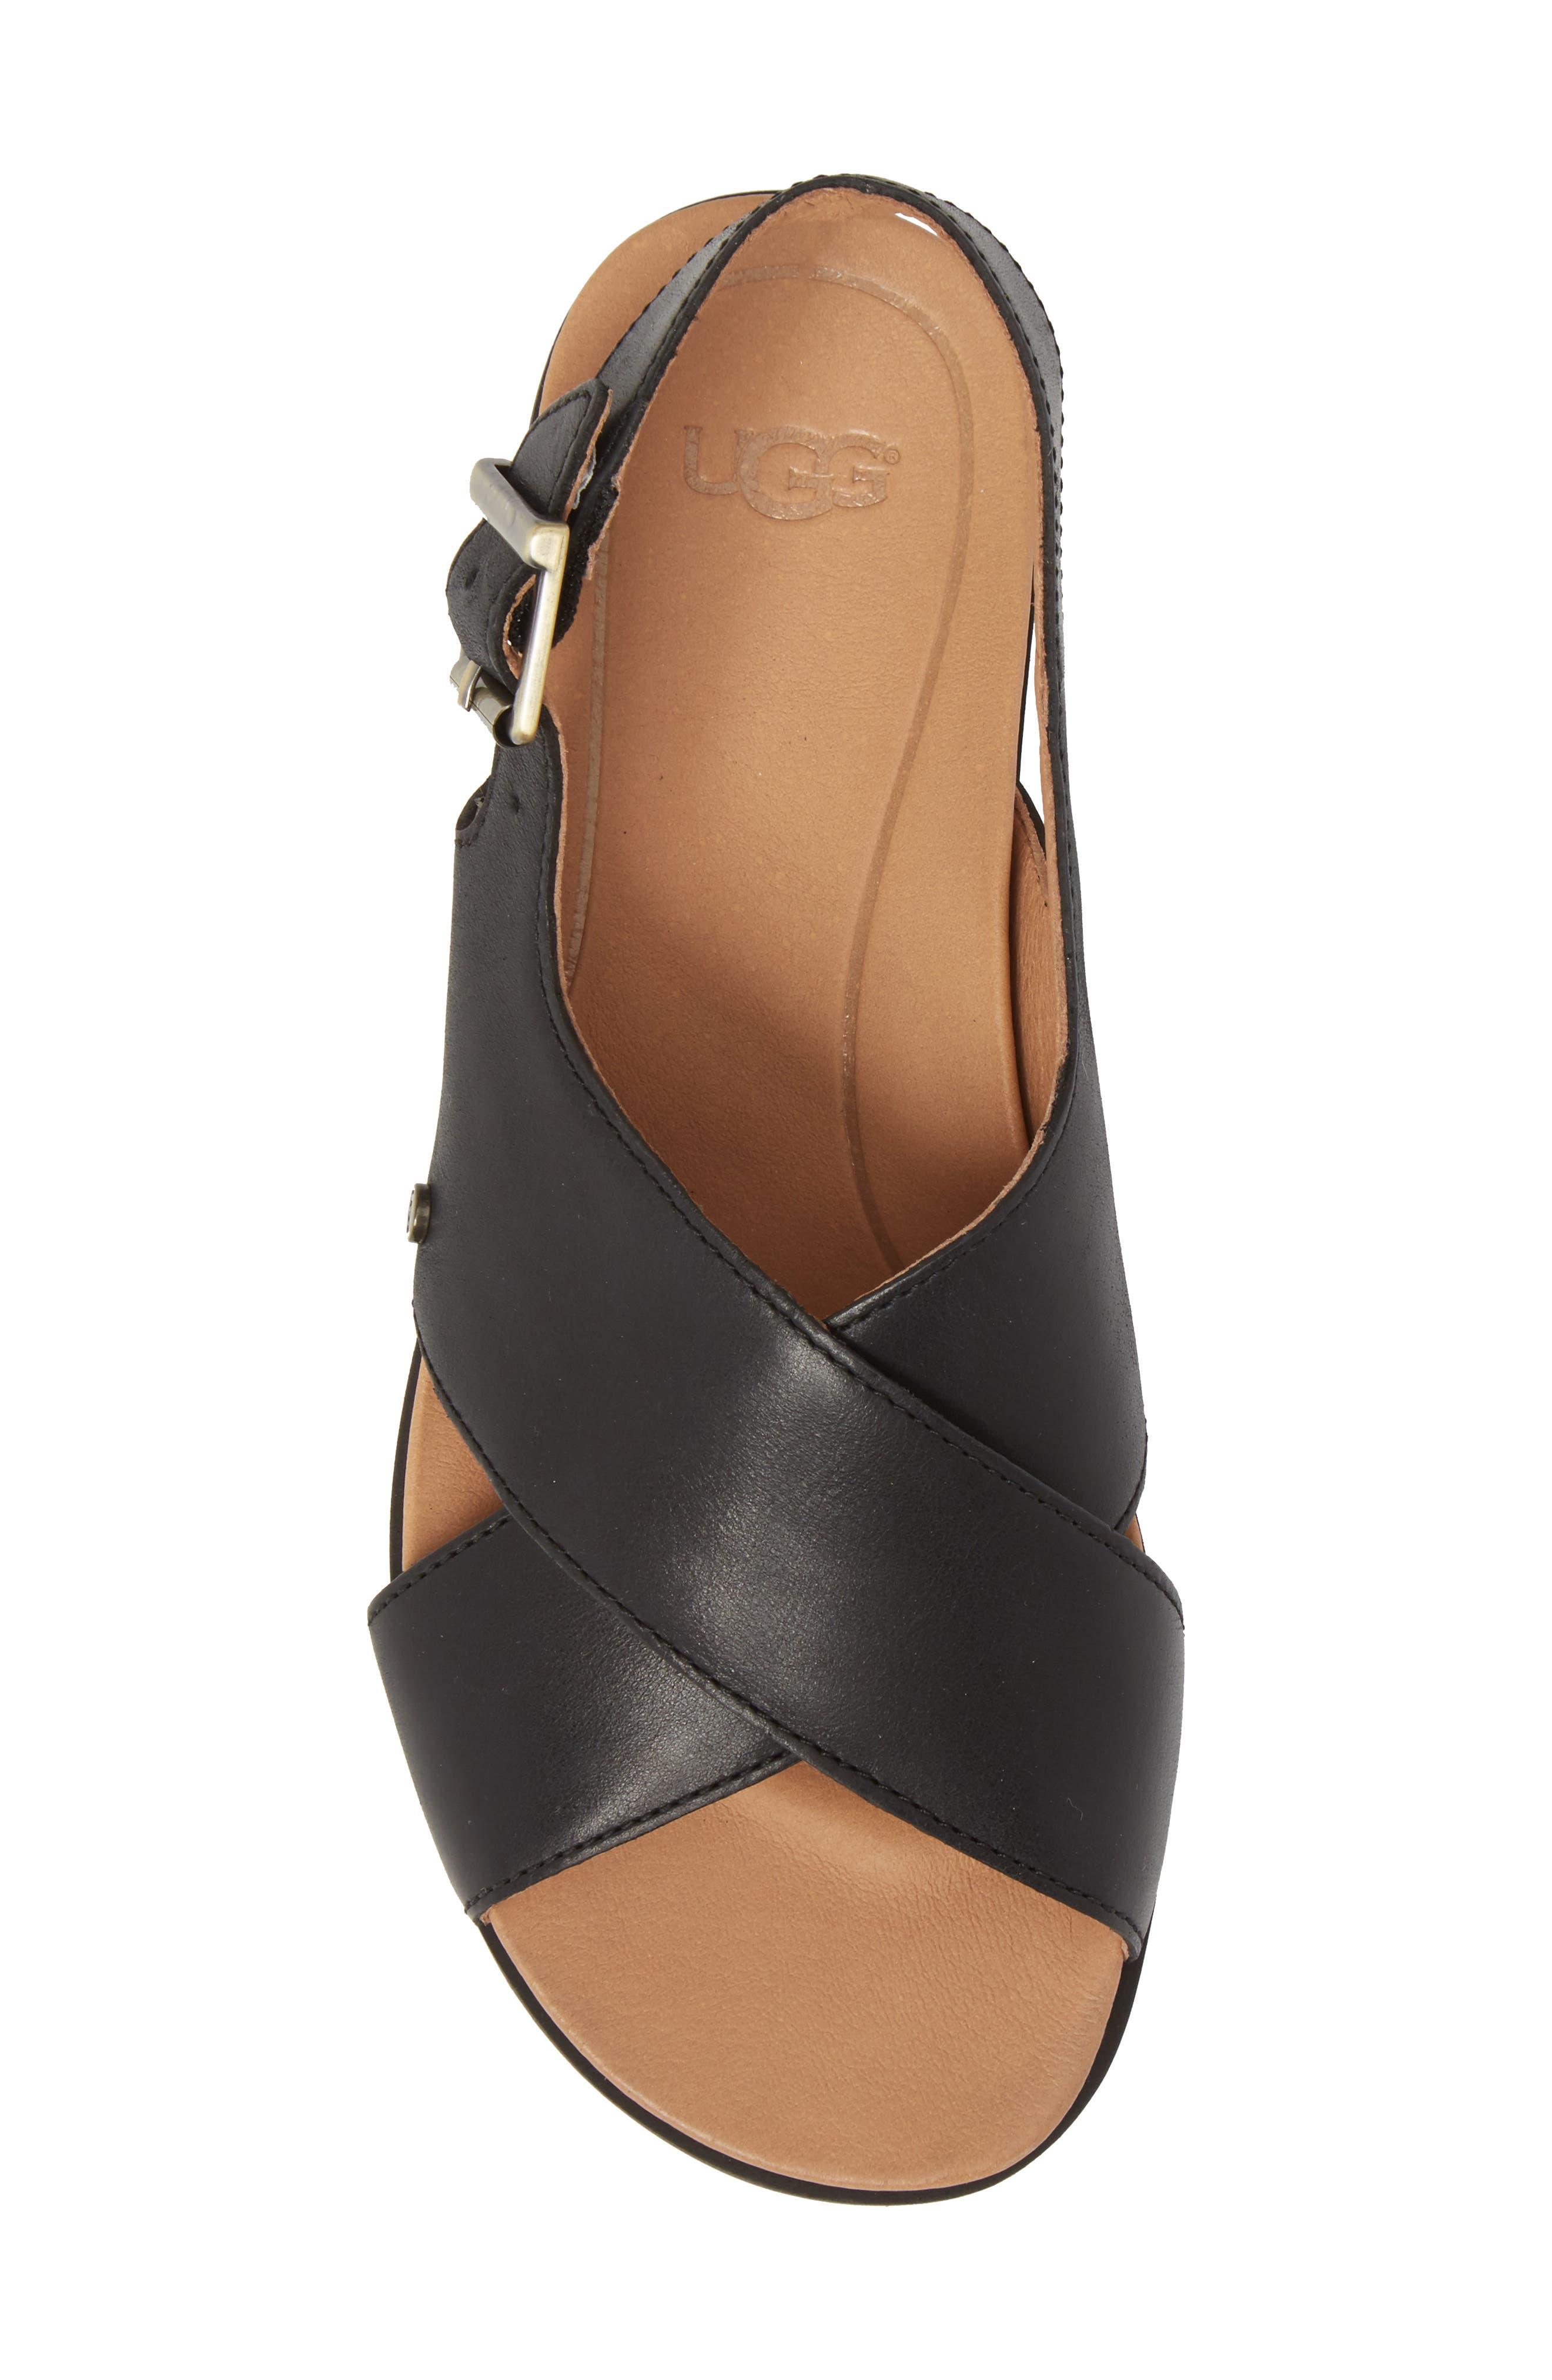 Kamile Sandal,                             Alternate thumbnail 5, color,                             Black Leather